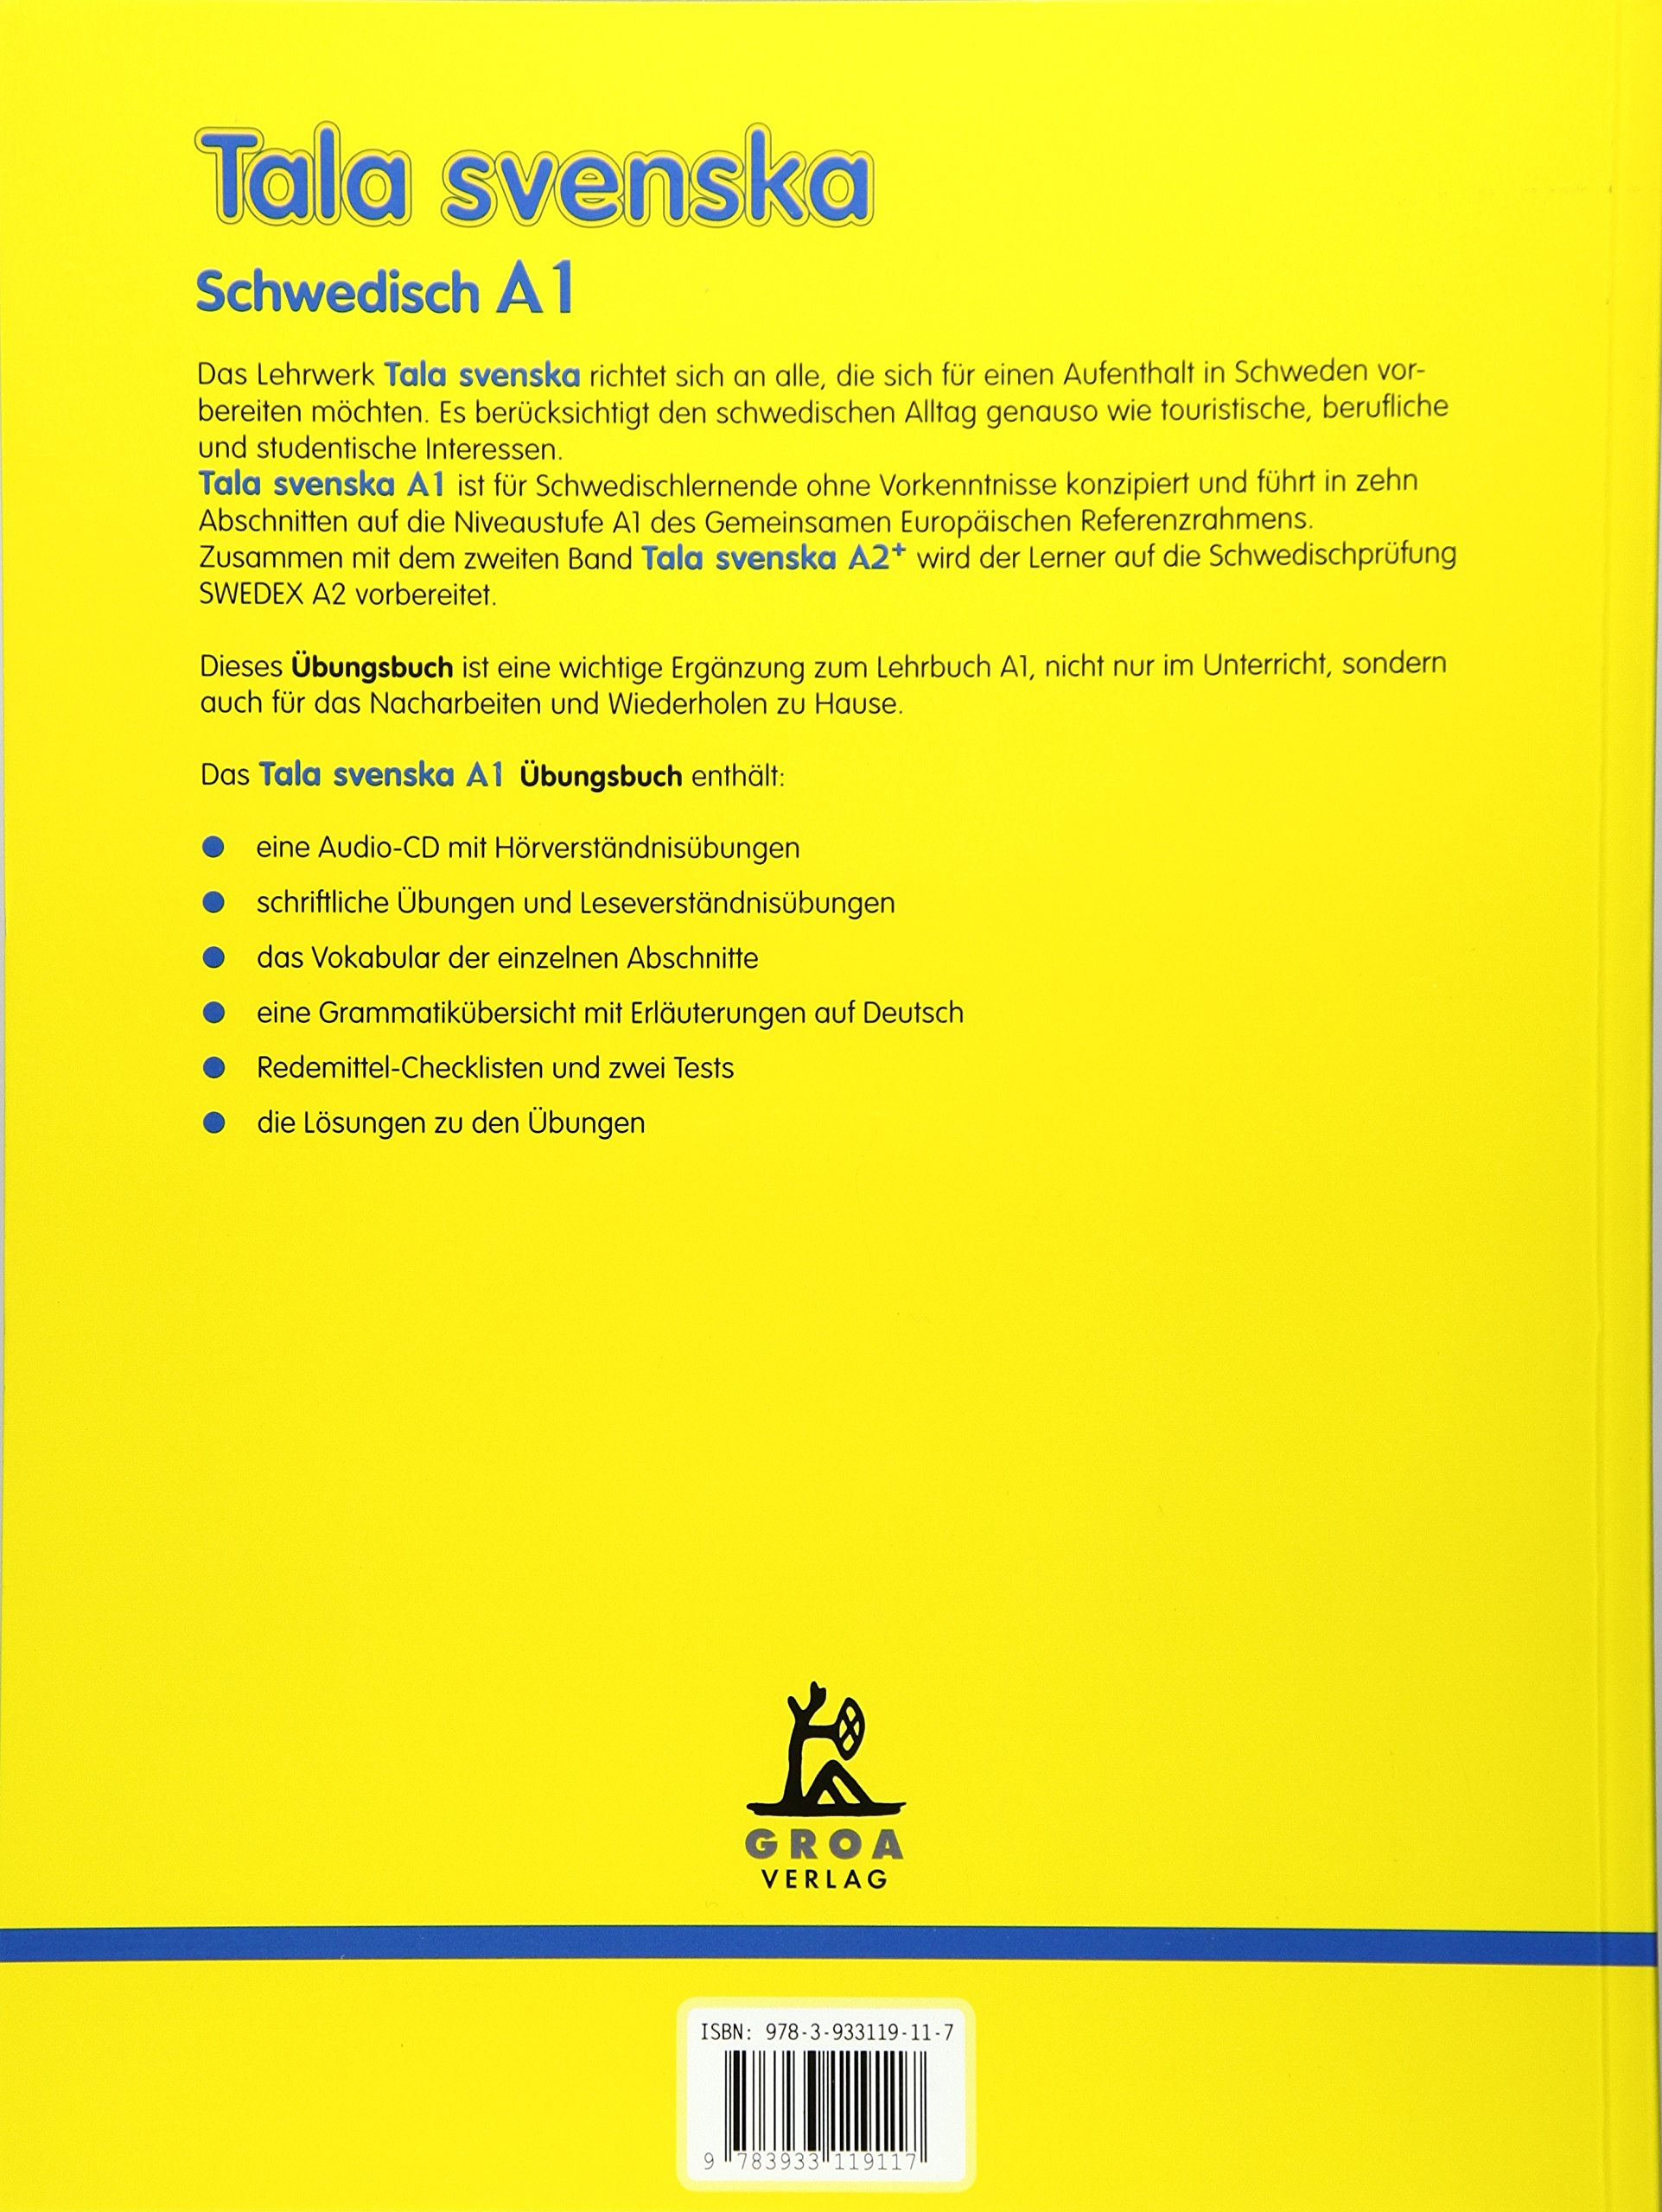 Tala svenska - Schwedisch / Tala svenska - Schwedisch A1: Übungsbuch ...